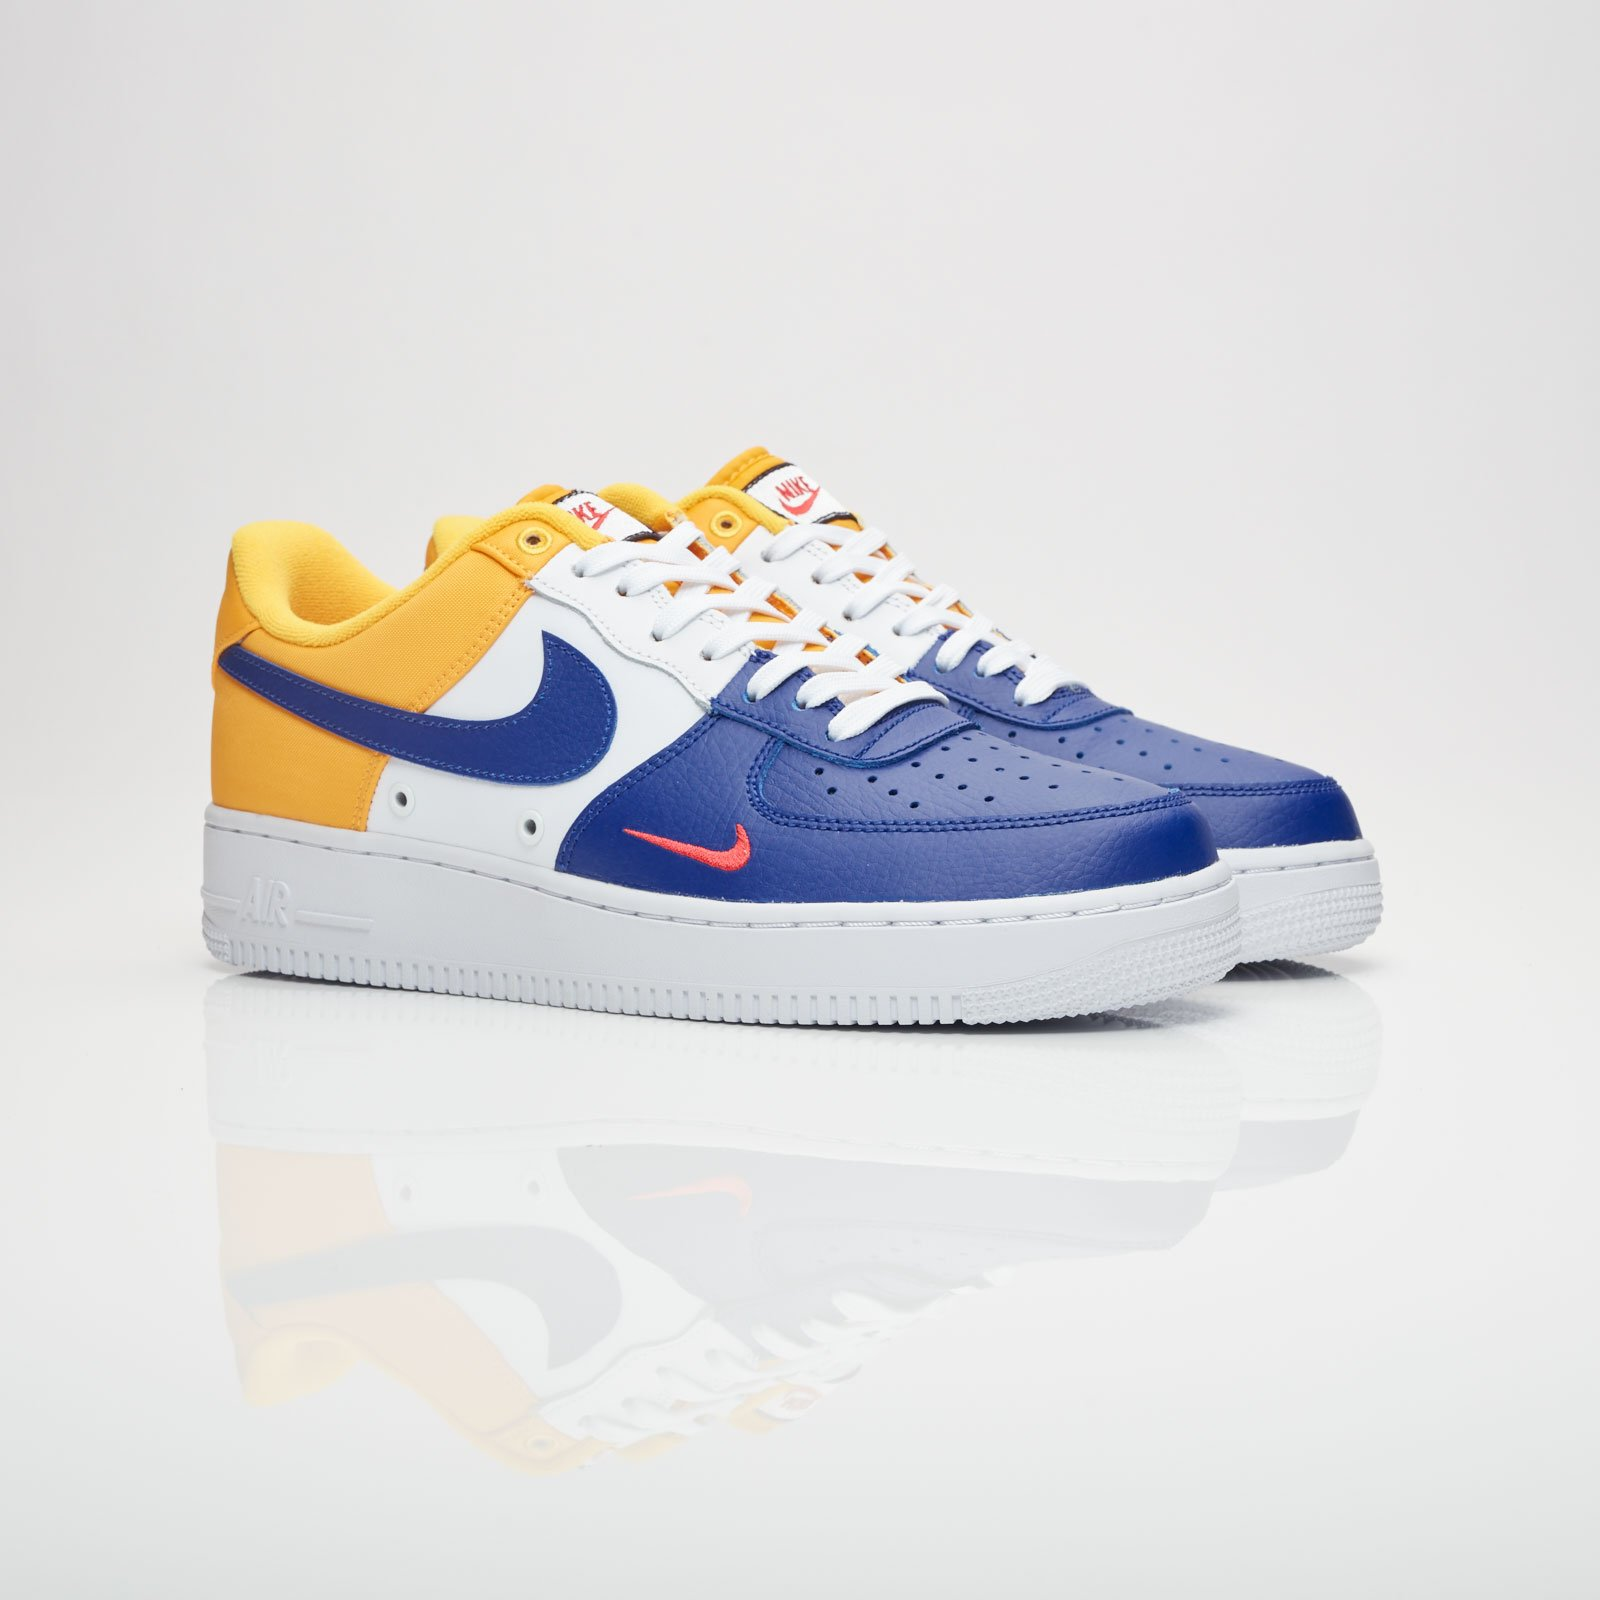 Nike Air Force 1 07 LV8 - 823511-404